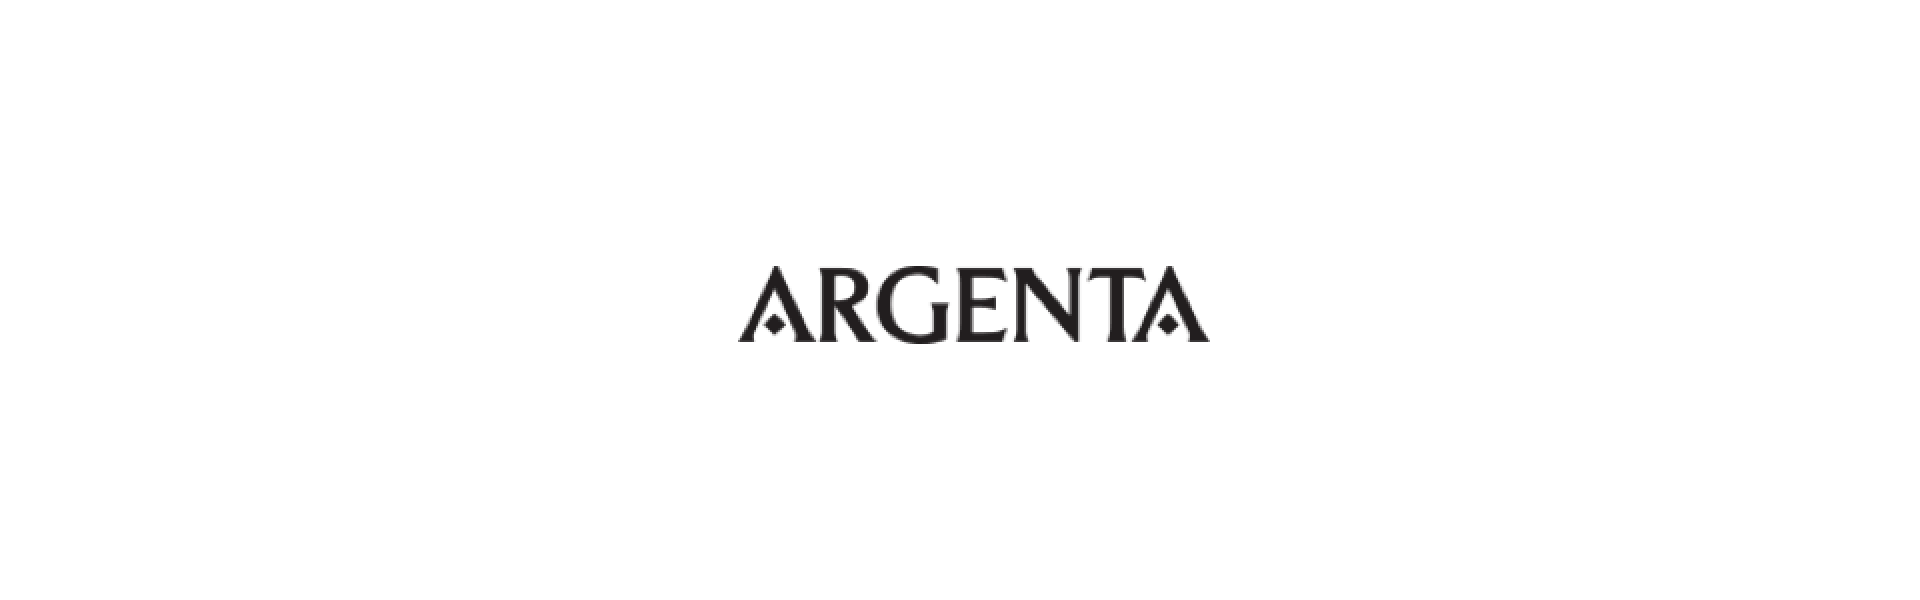 Argenta © Parket-Home